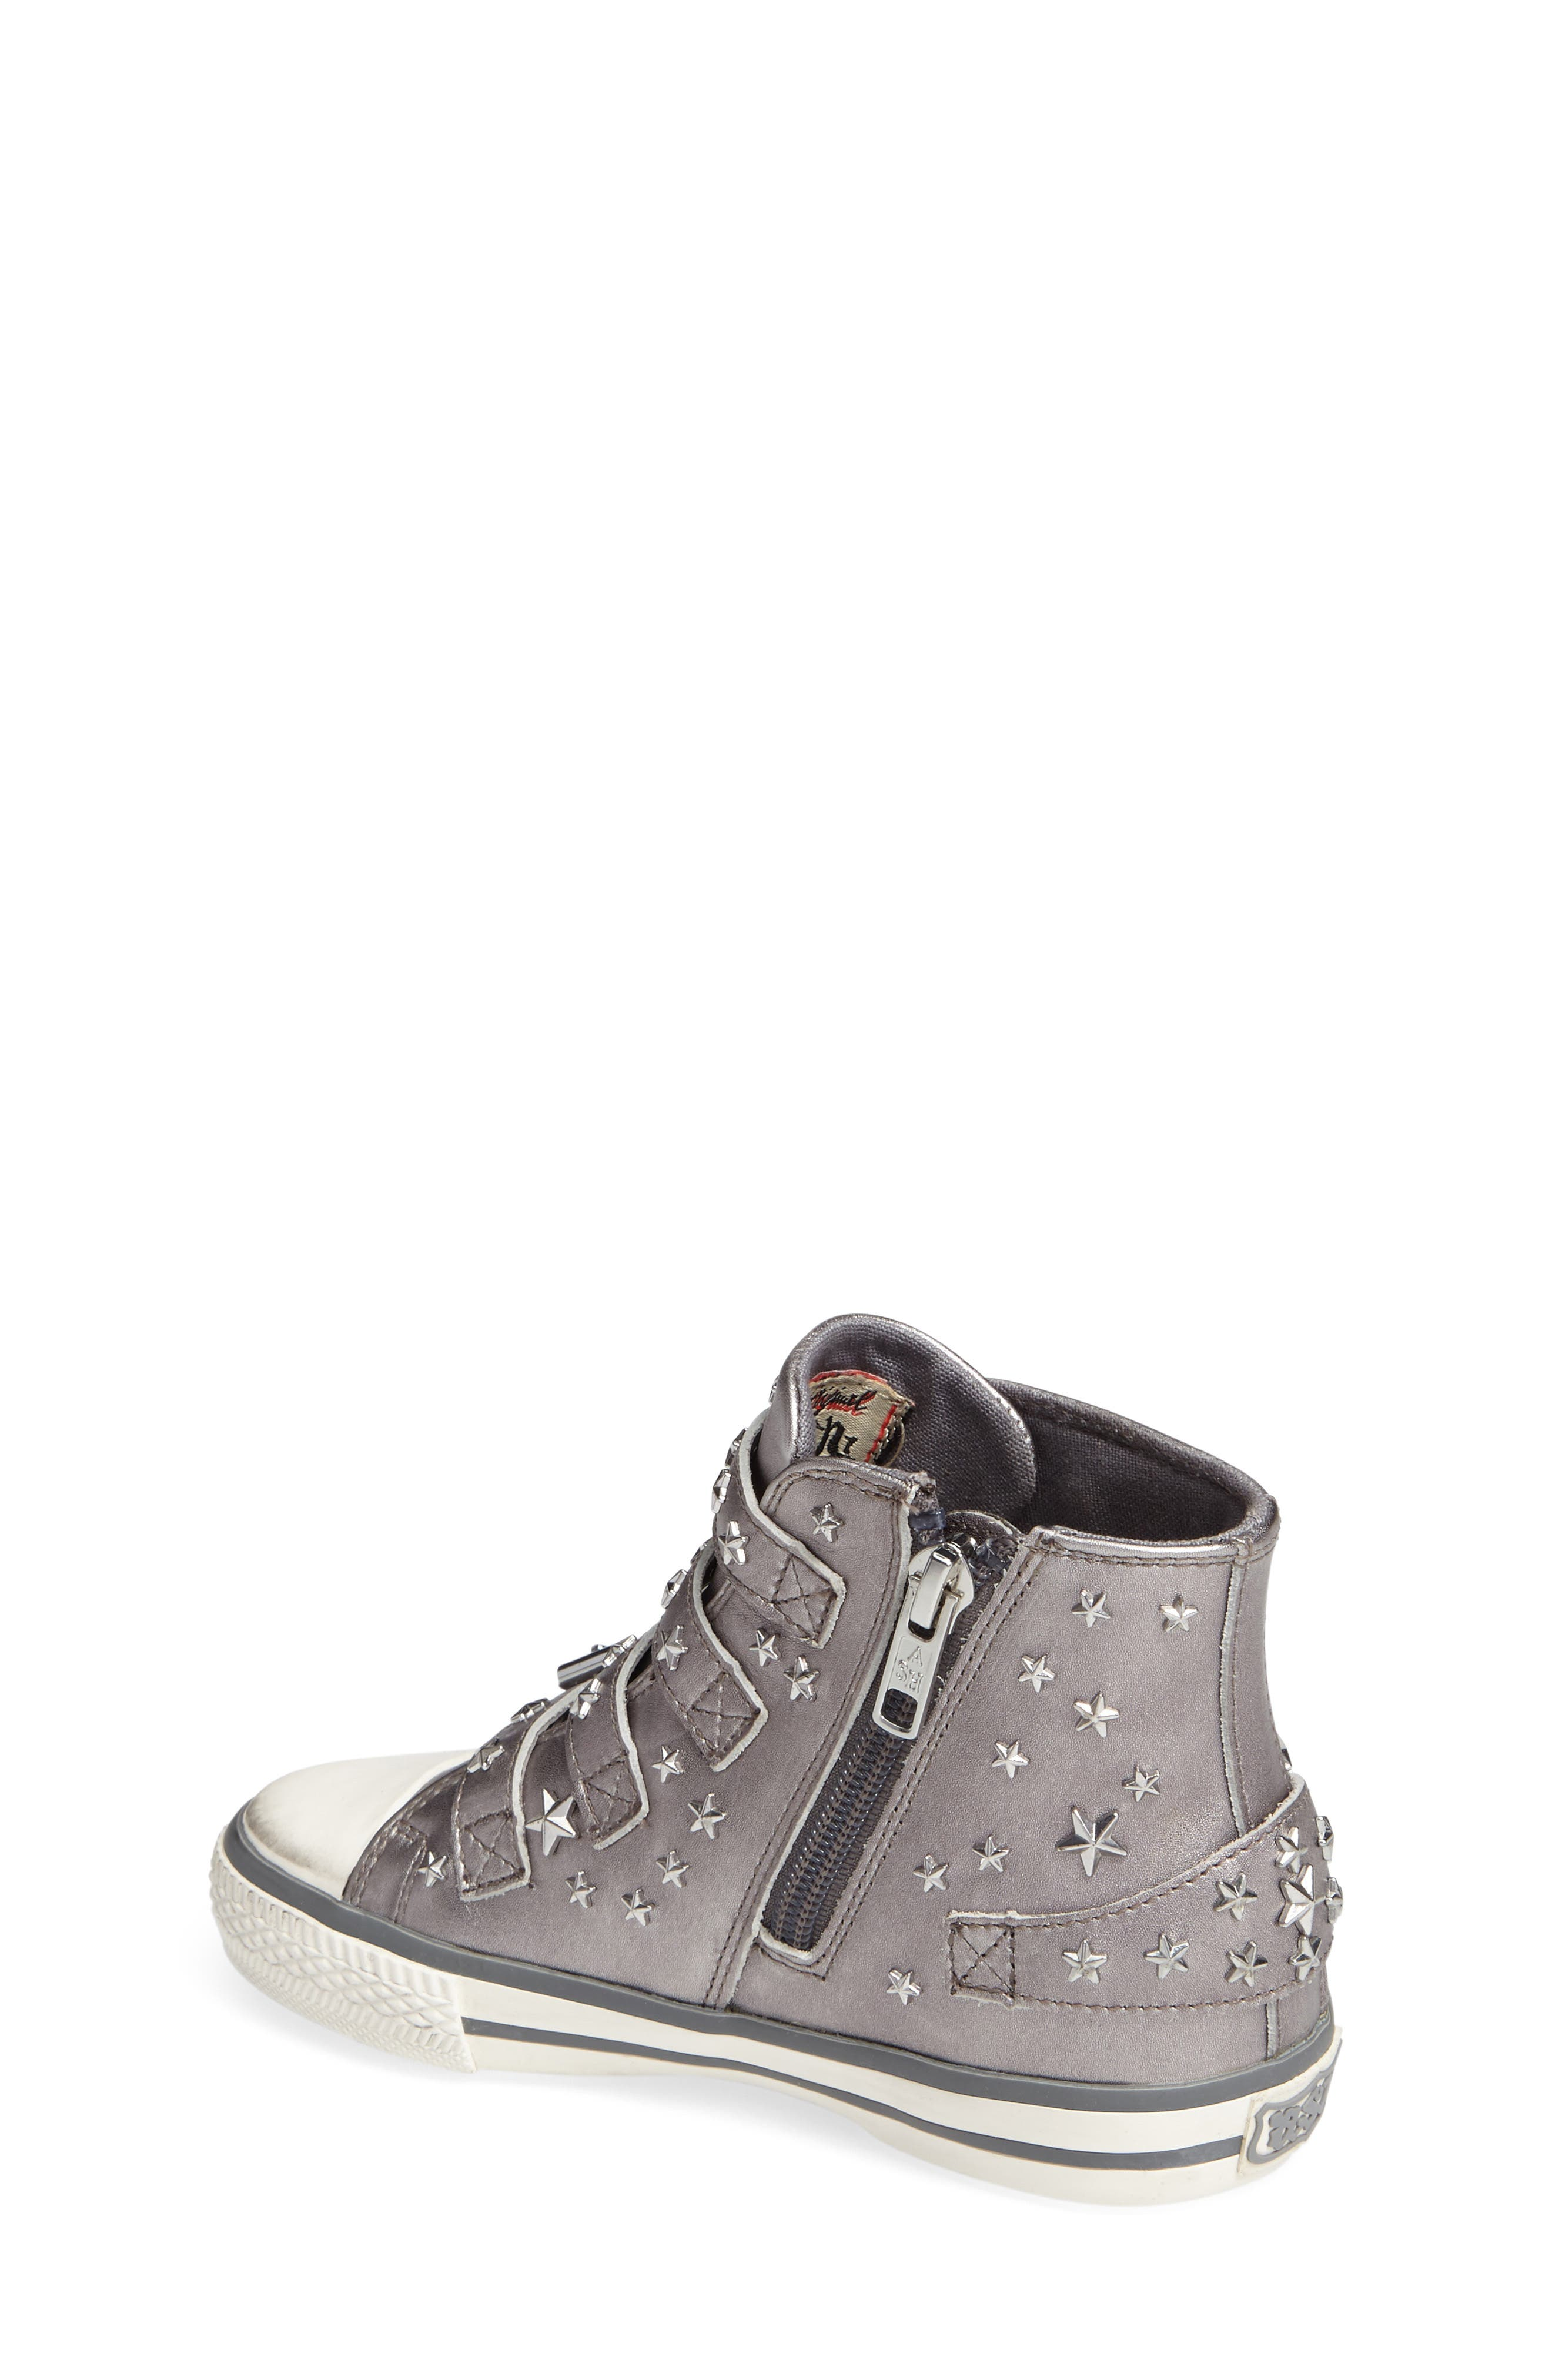 Vava Star Stud Sneaker,                             Alternate thumbnail 2, color,                             081